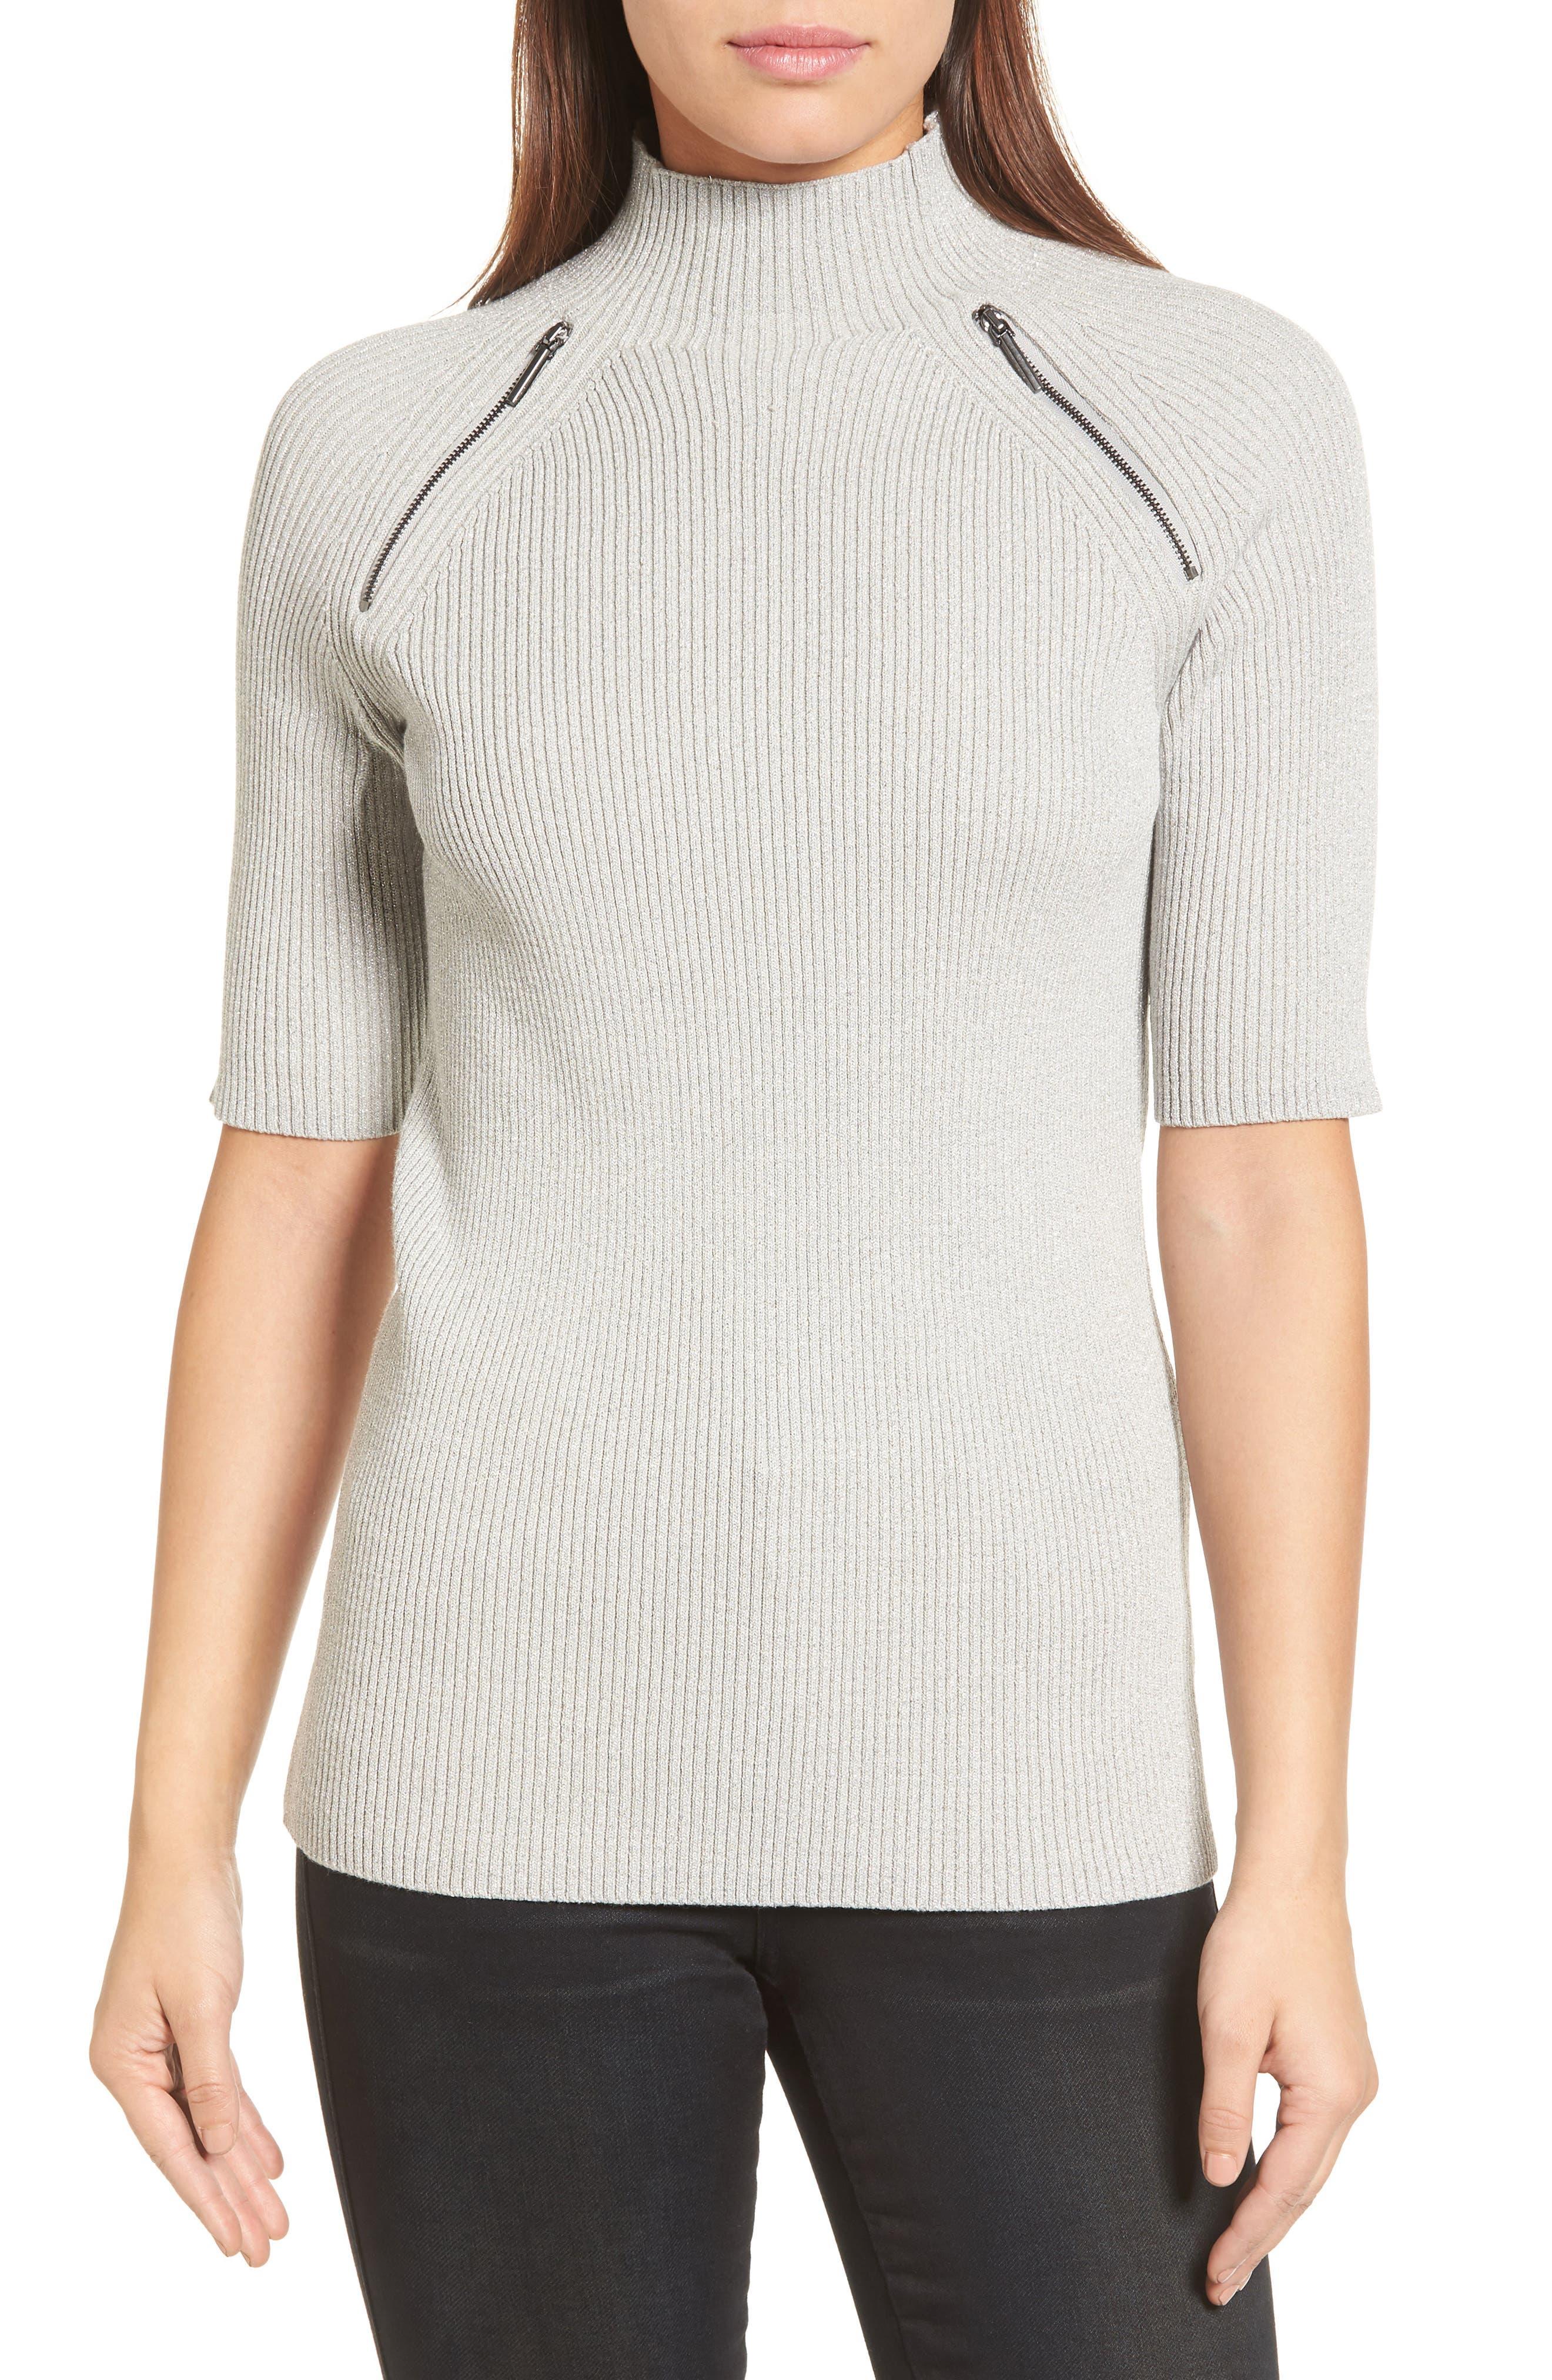 Elbow Sleeve Mock Neck Sweater,                             Main thumbnail 1, color,                             LIGHT GRAY